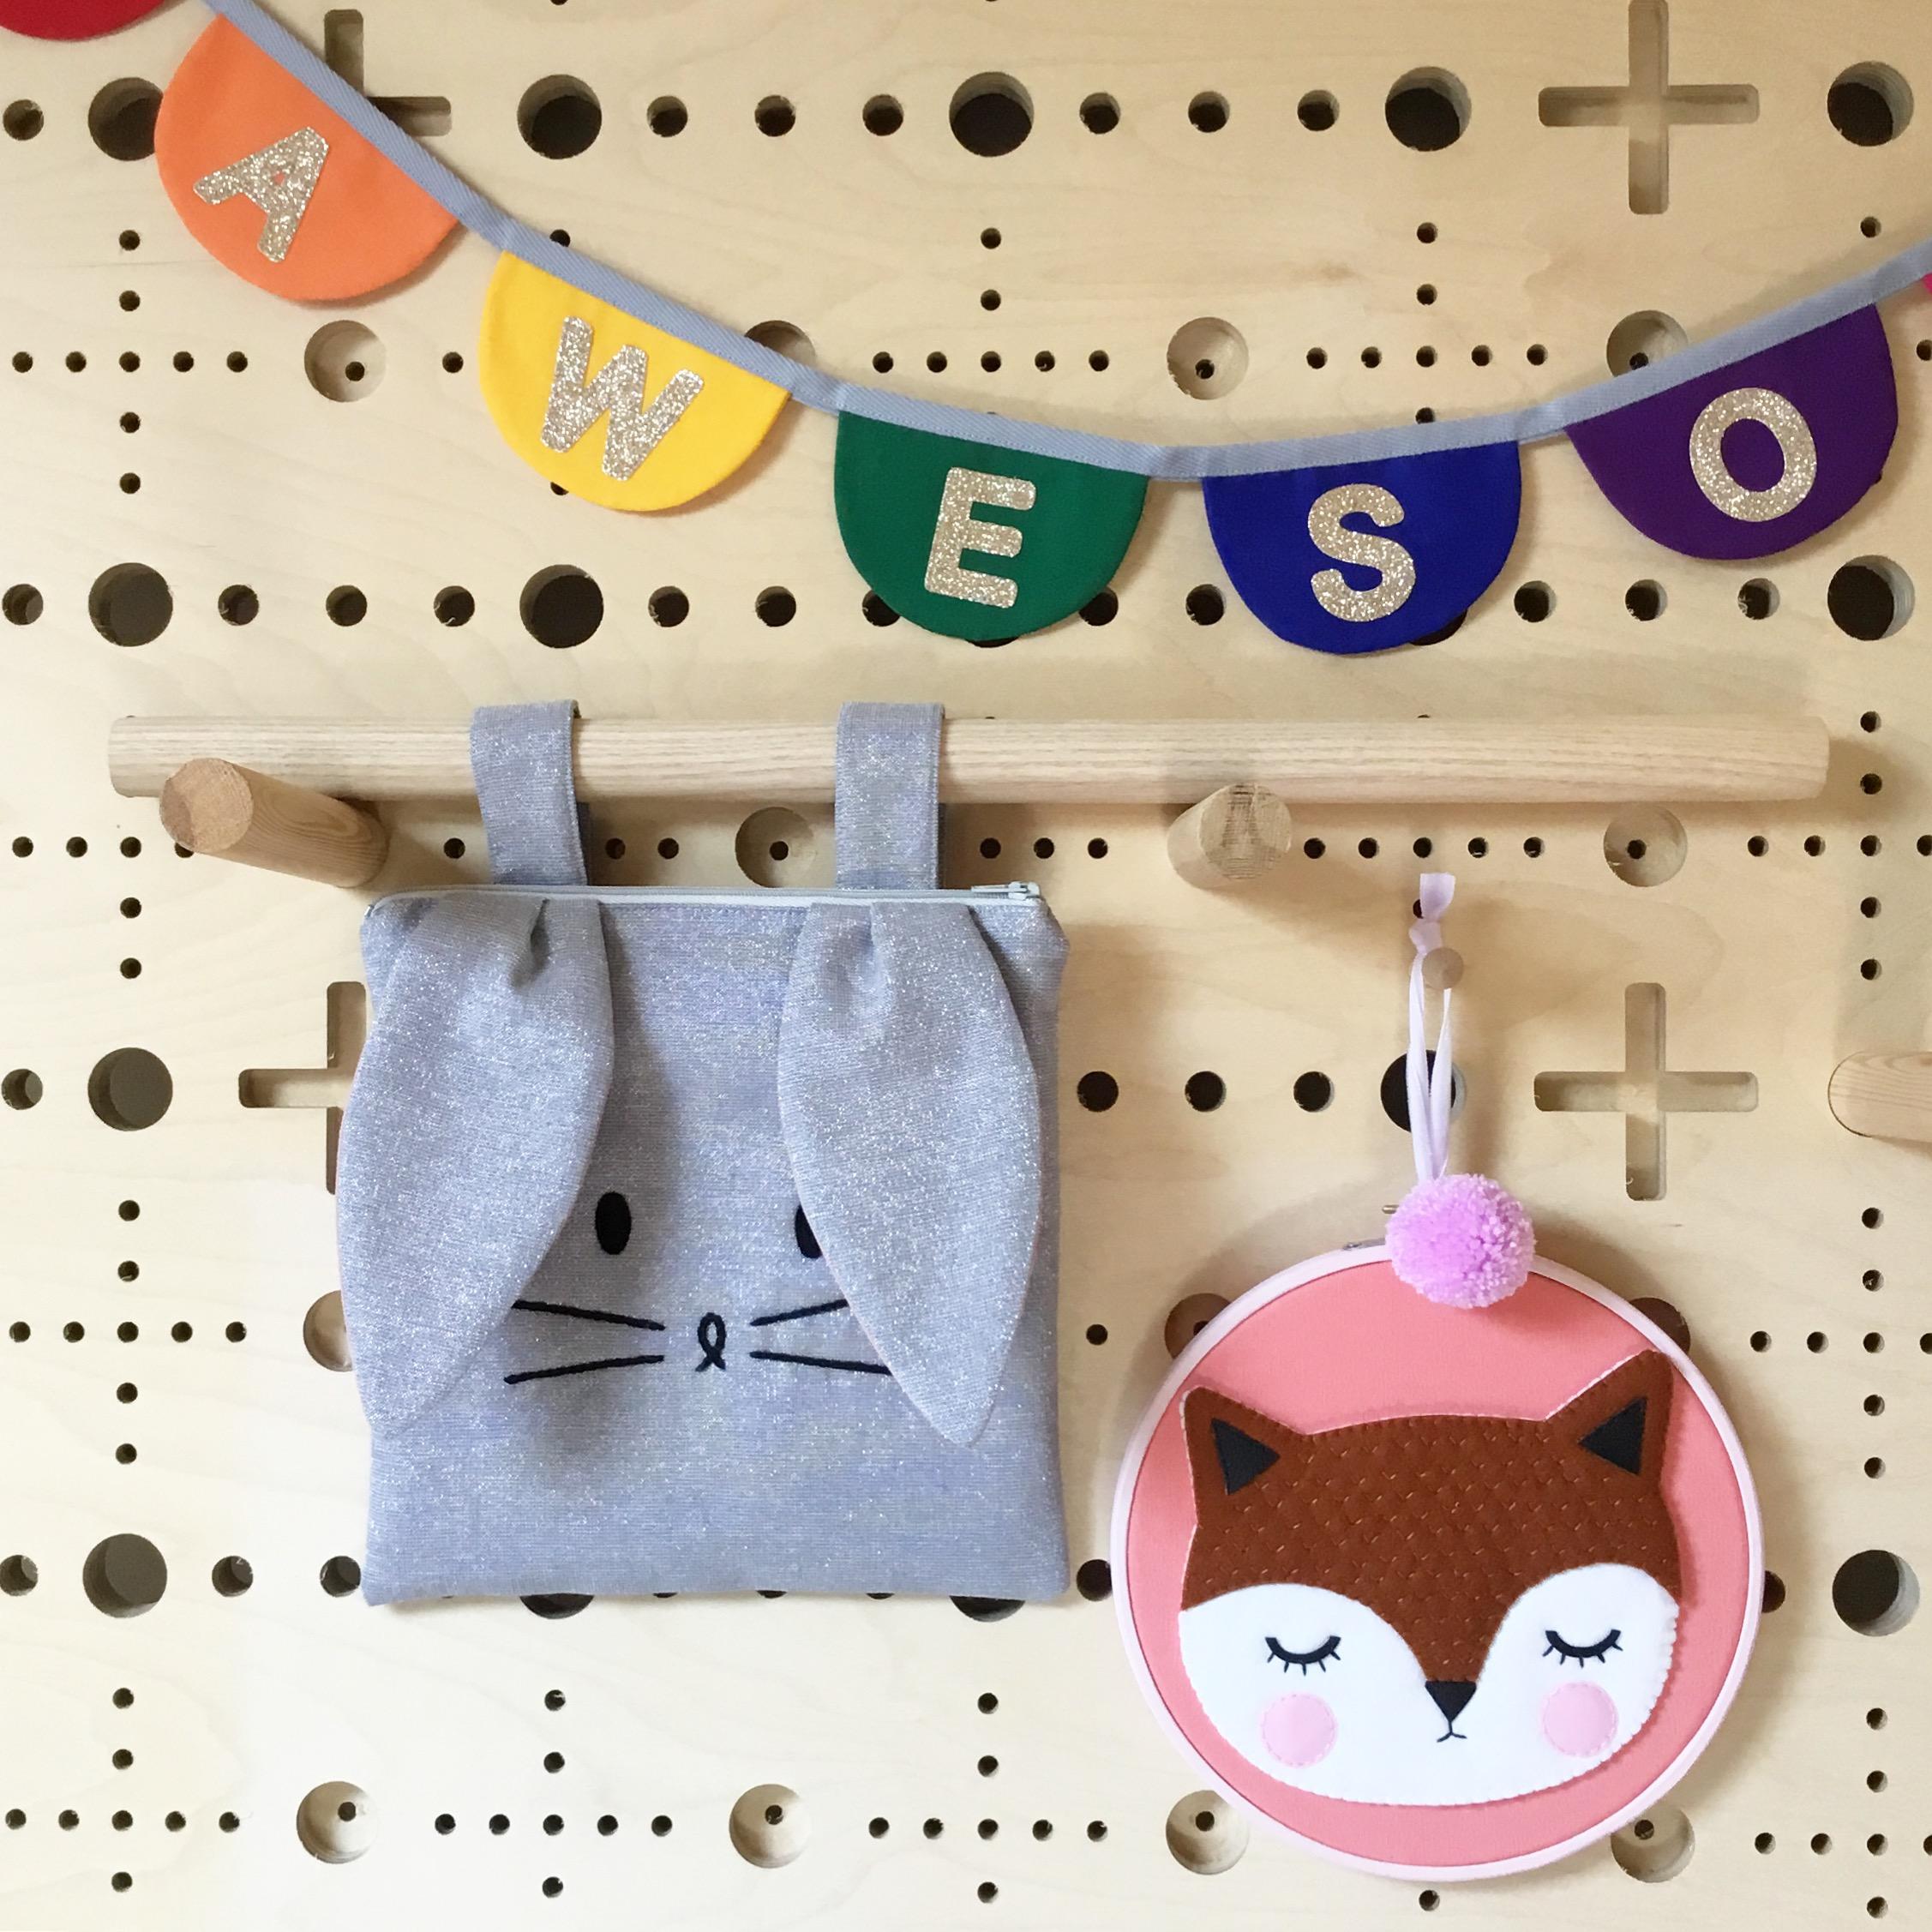 Sparkly Grey Metallic Bag with Straps